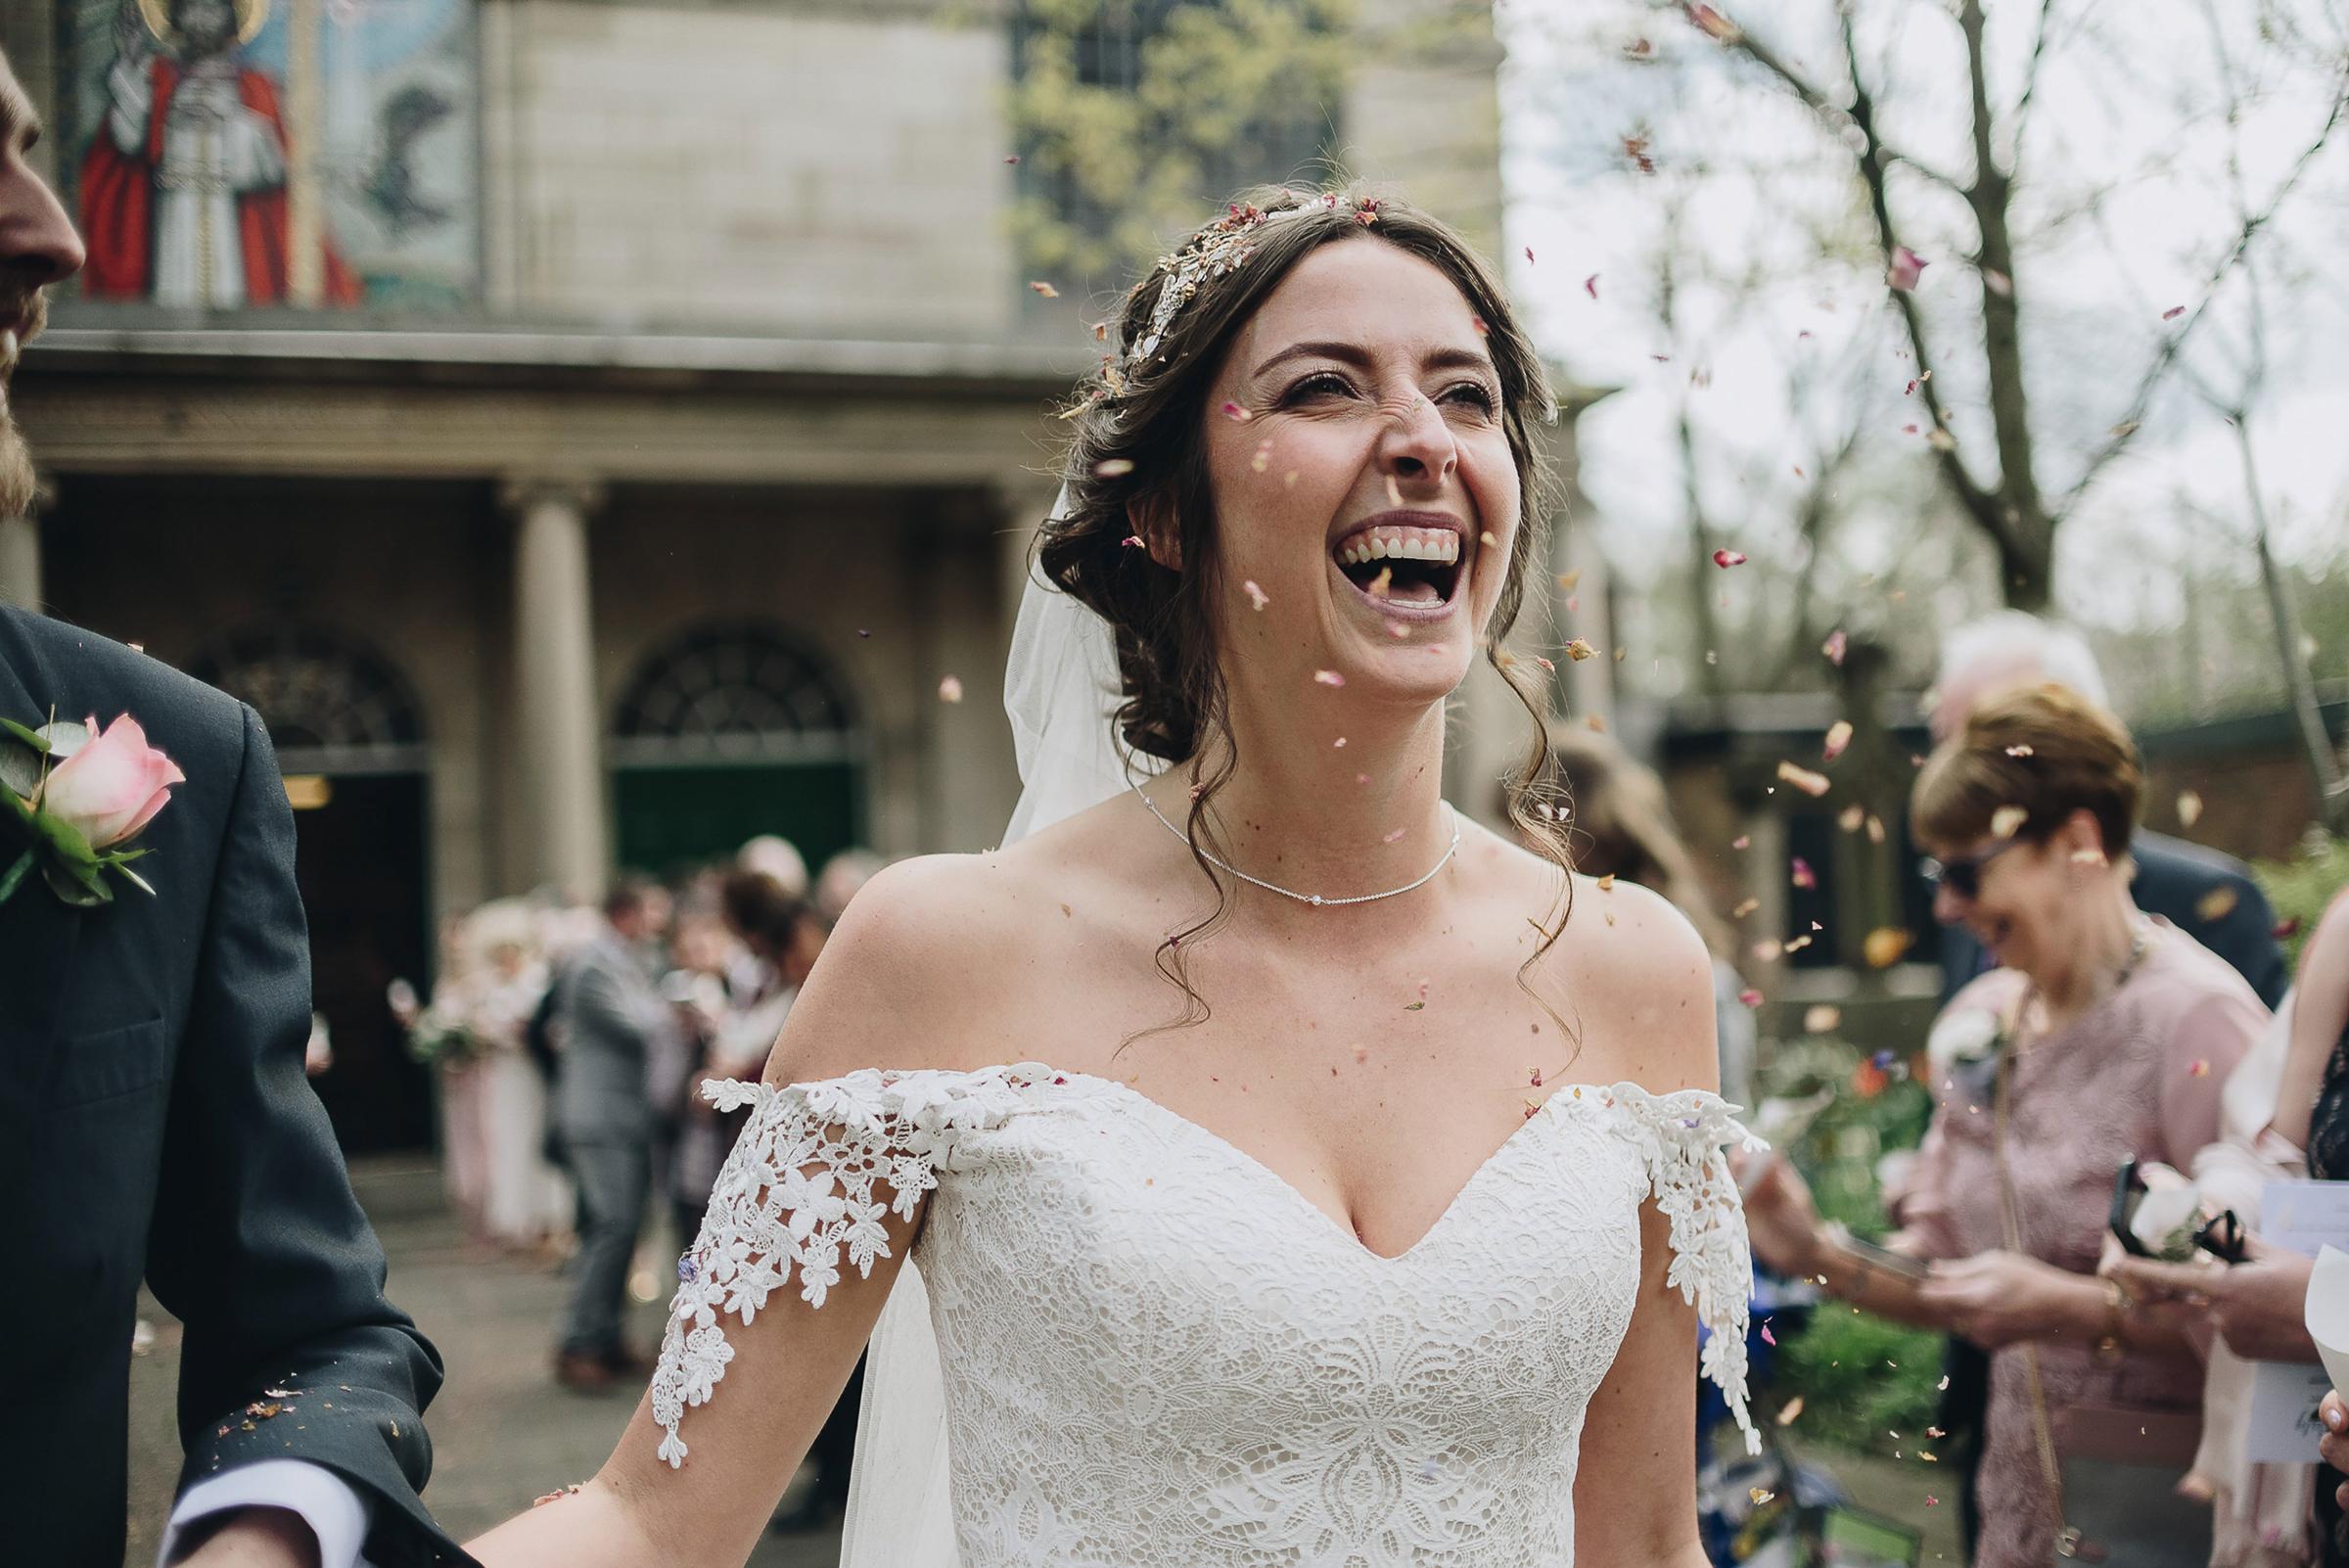 Rochdale-town-hall-vegan-harry-potter-wedding-photography-23.jpg